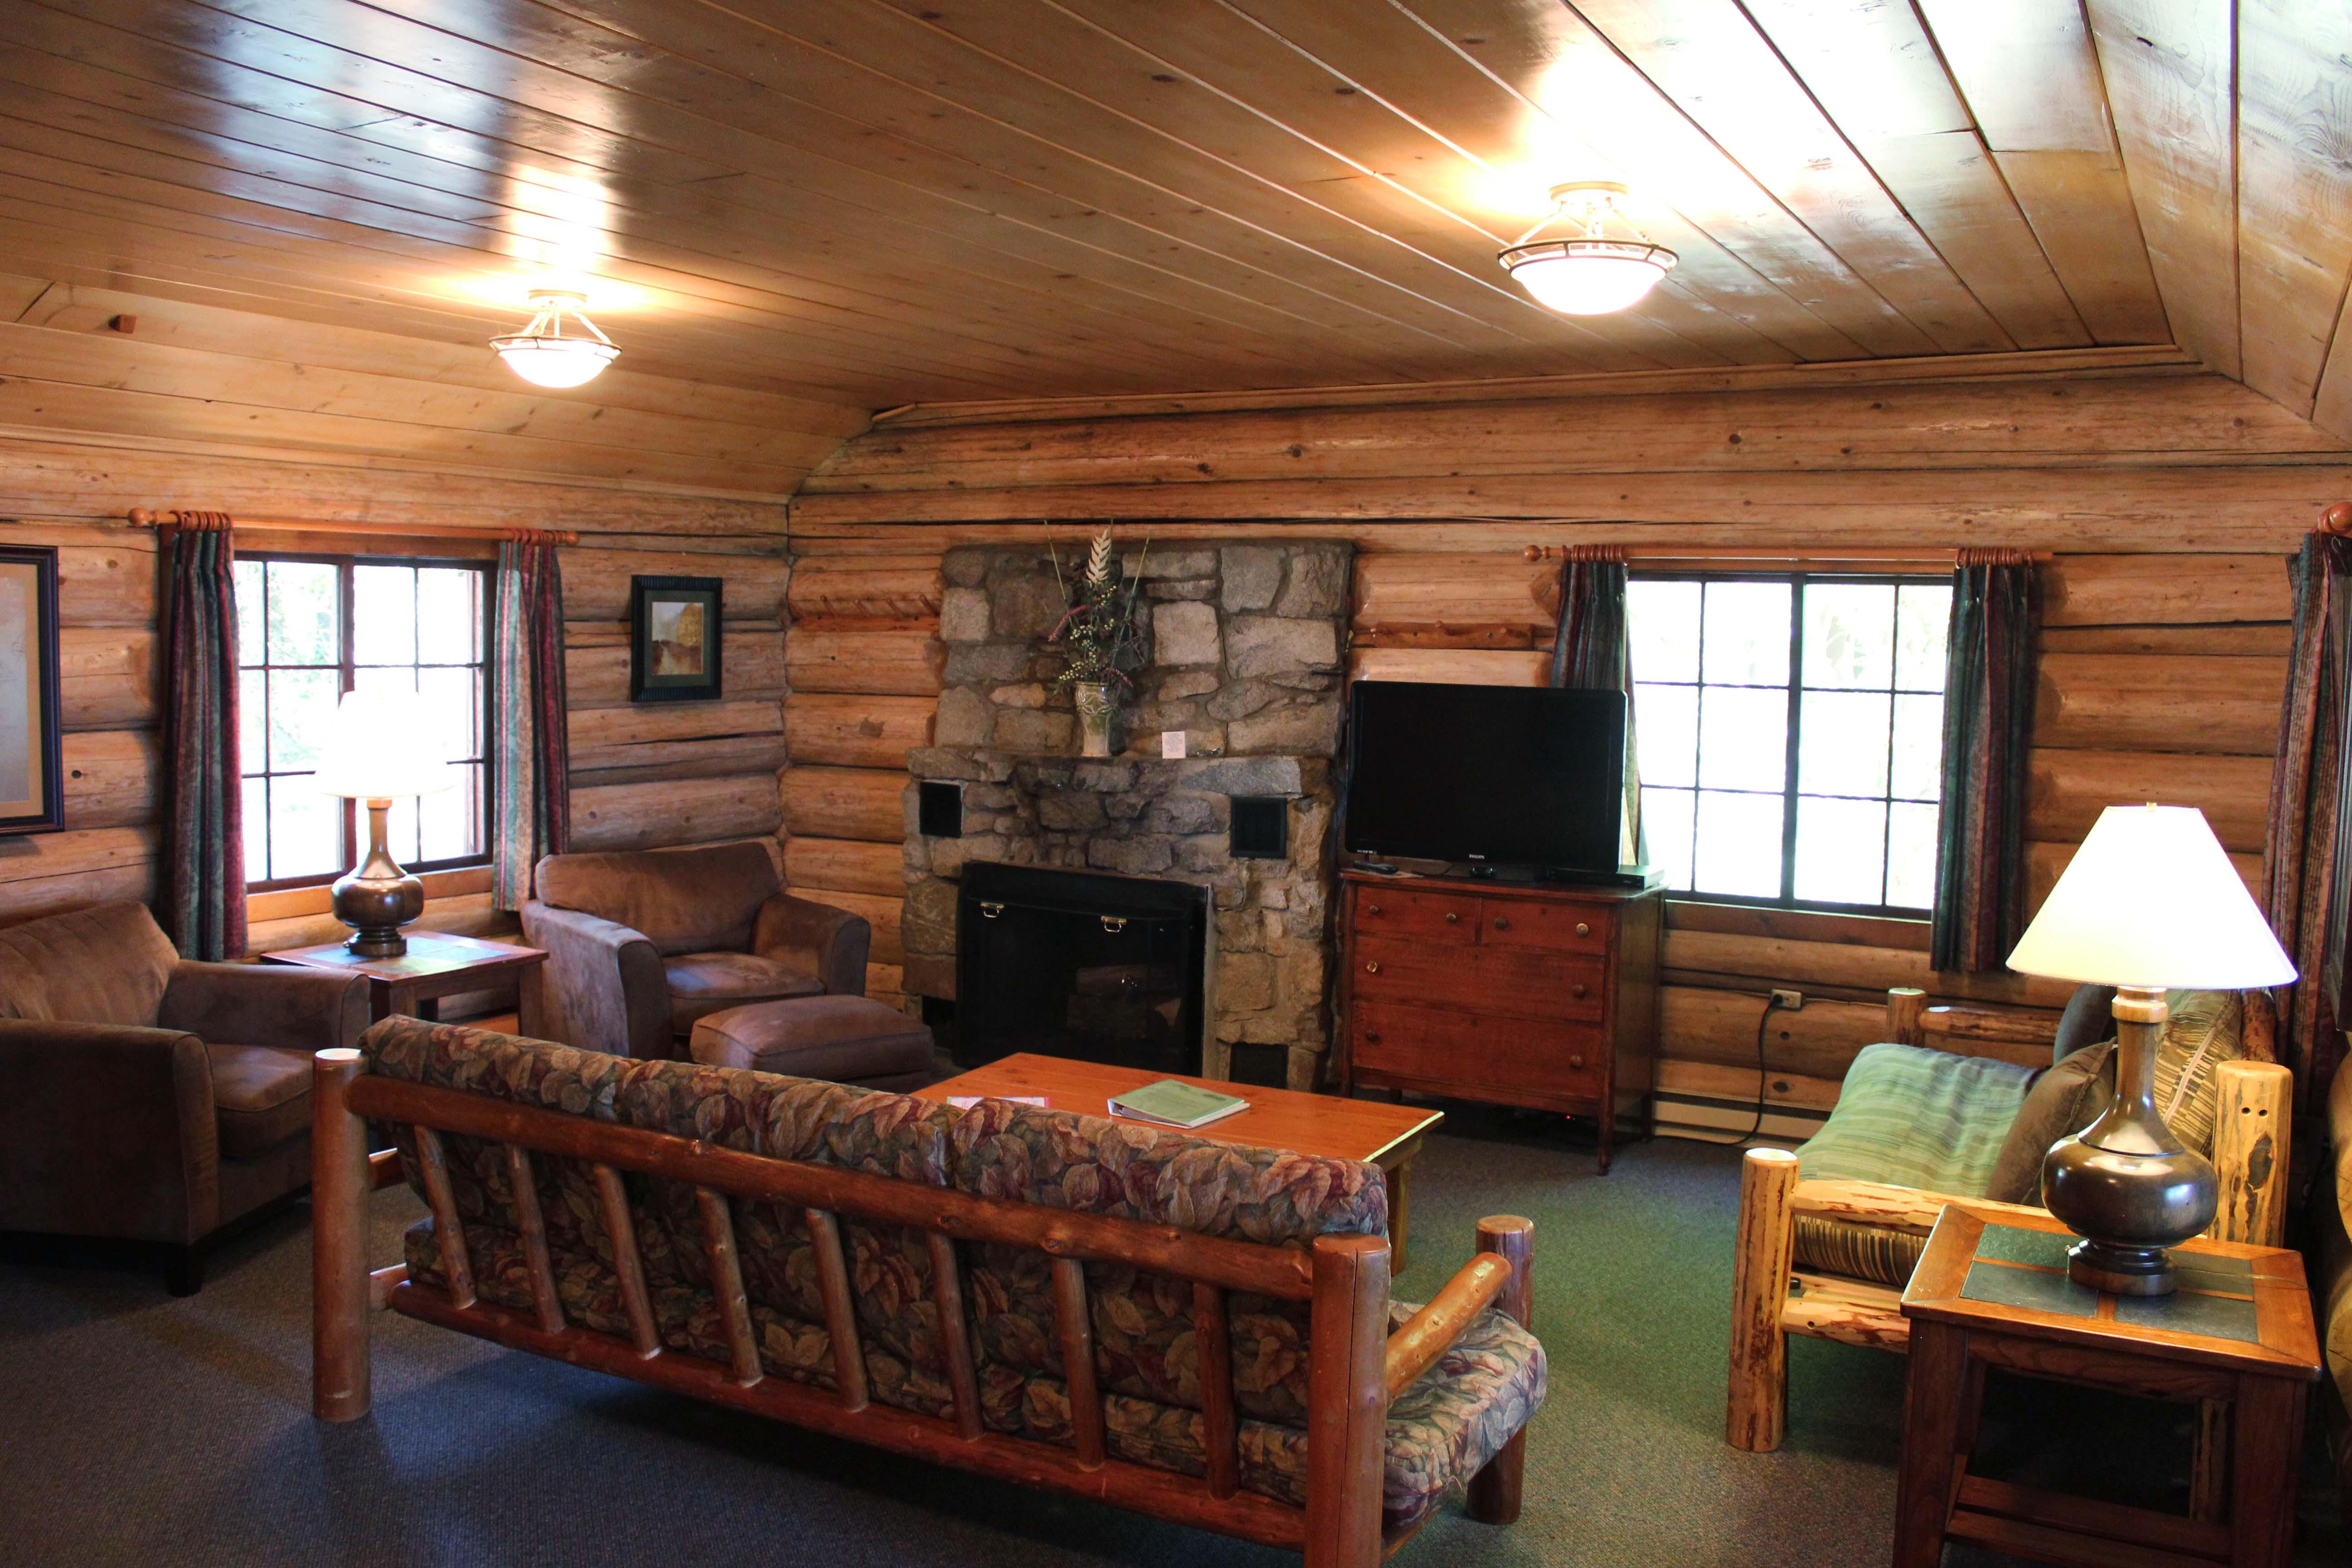 Rental cabins in idaho elkins resort on priest lake for Pictures inside